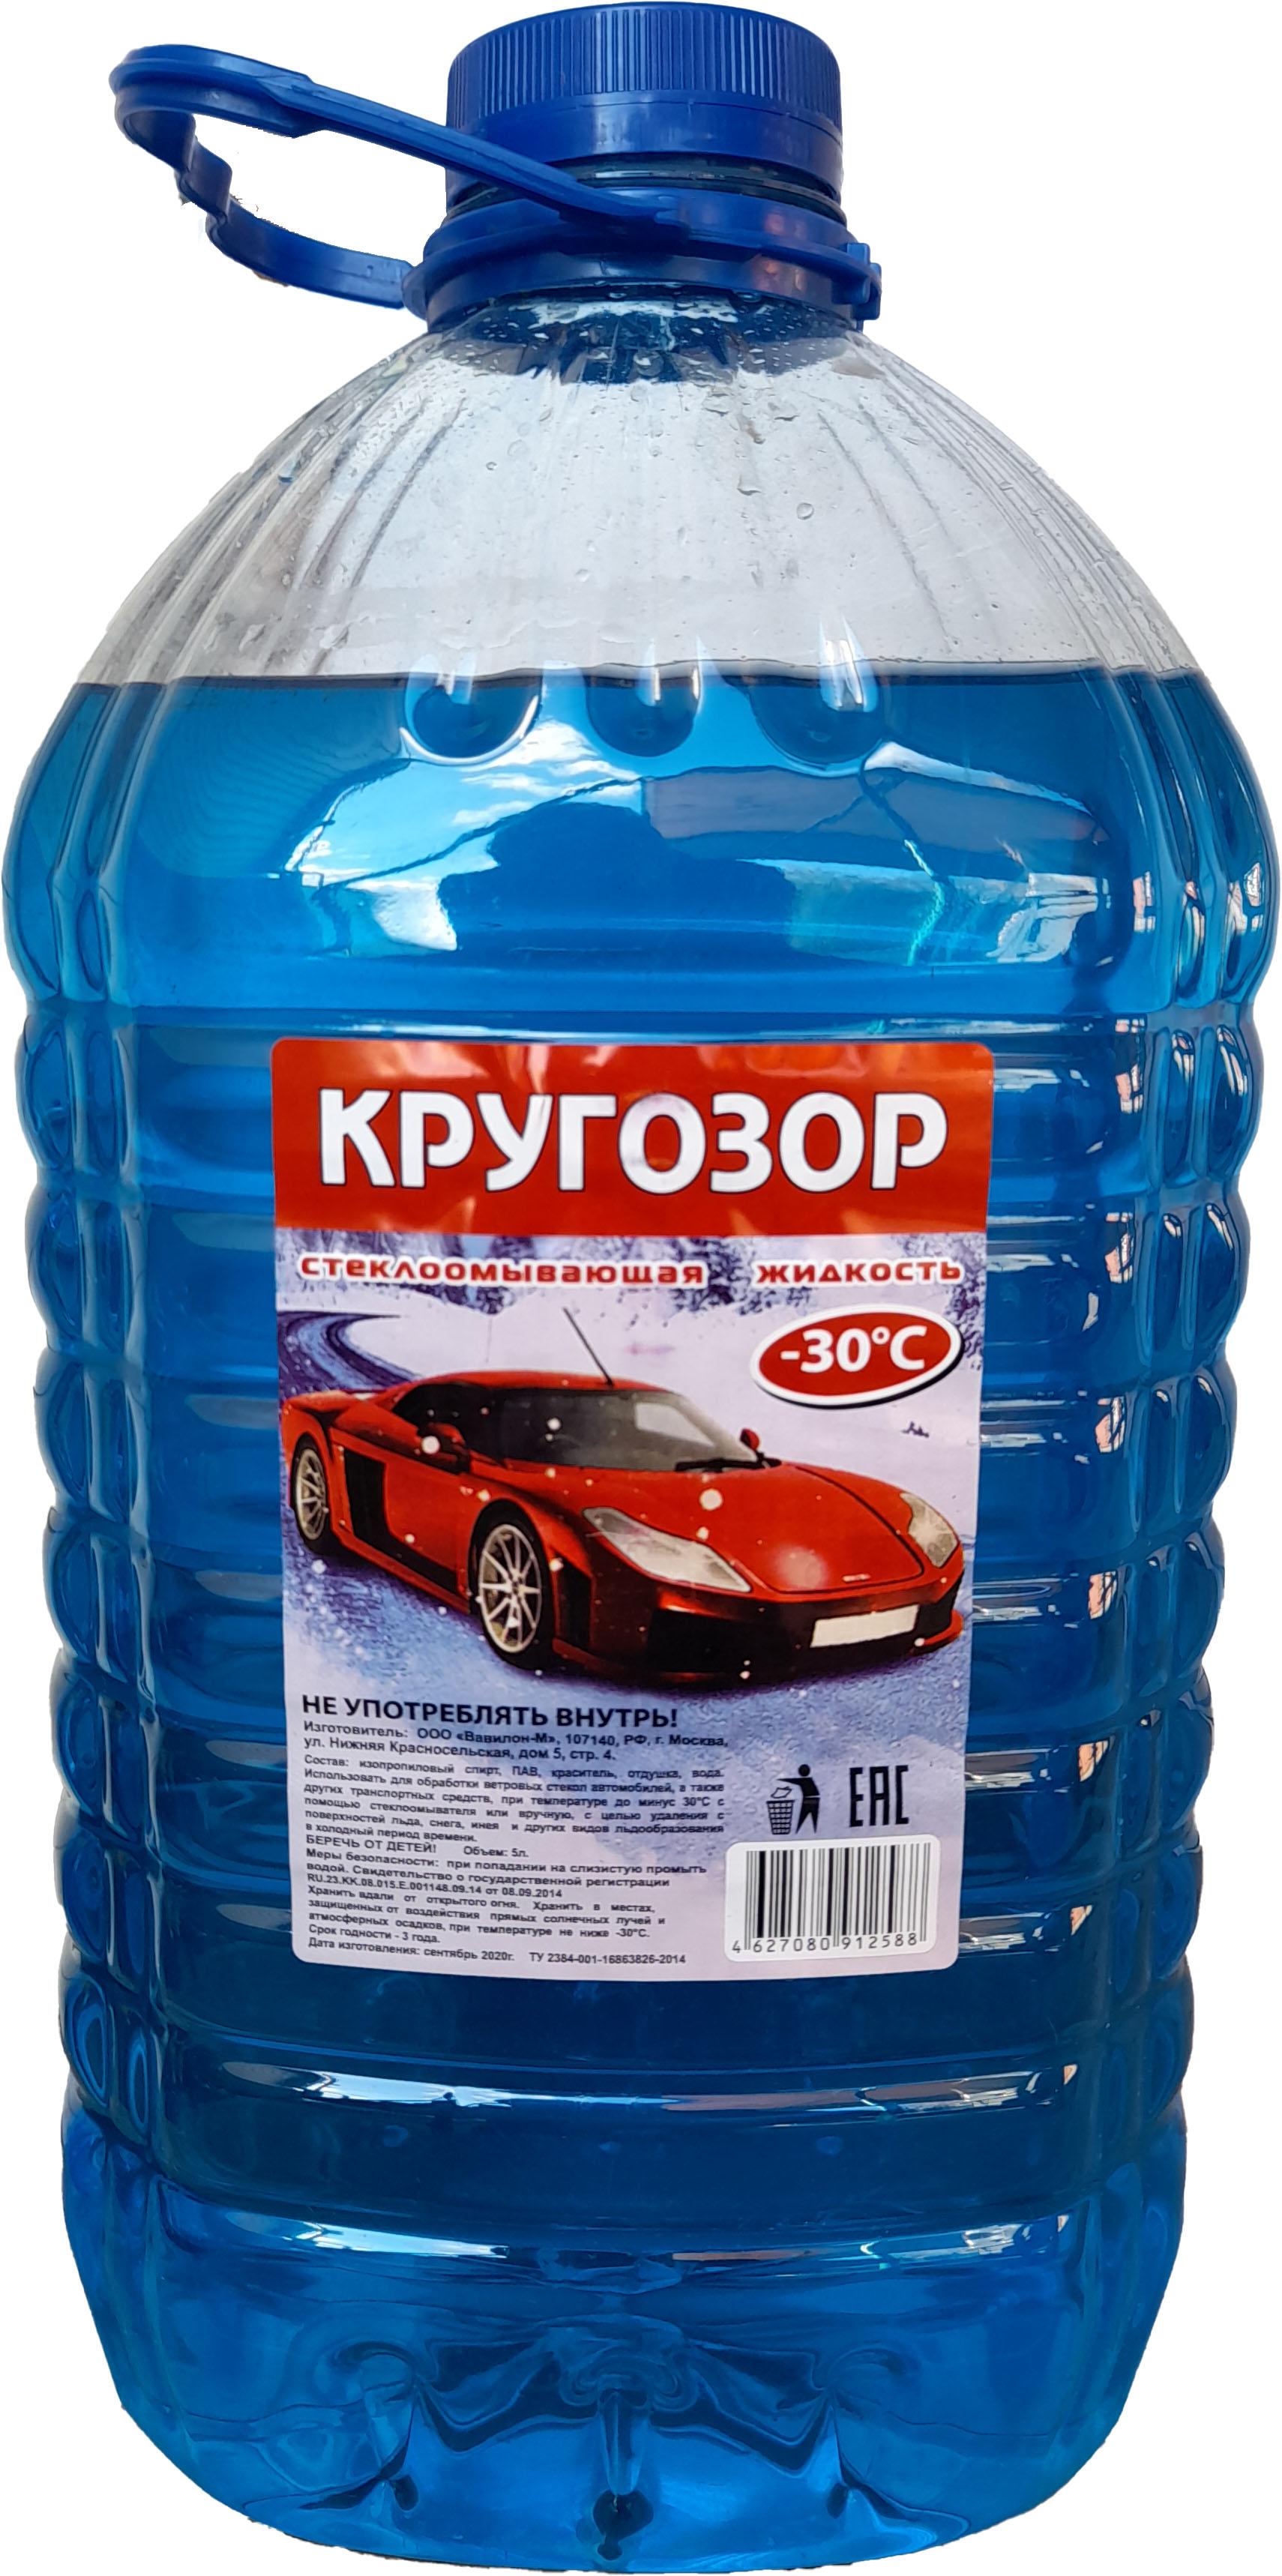 Жидкость стеклоомывателя Кругозор  30/Н 30